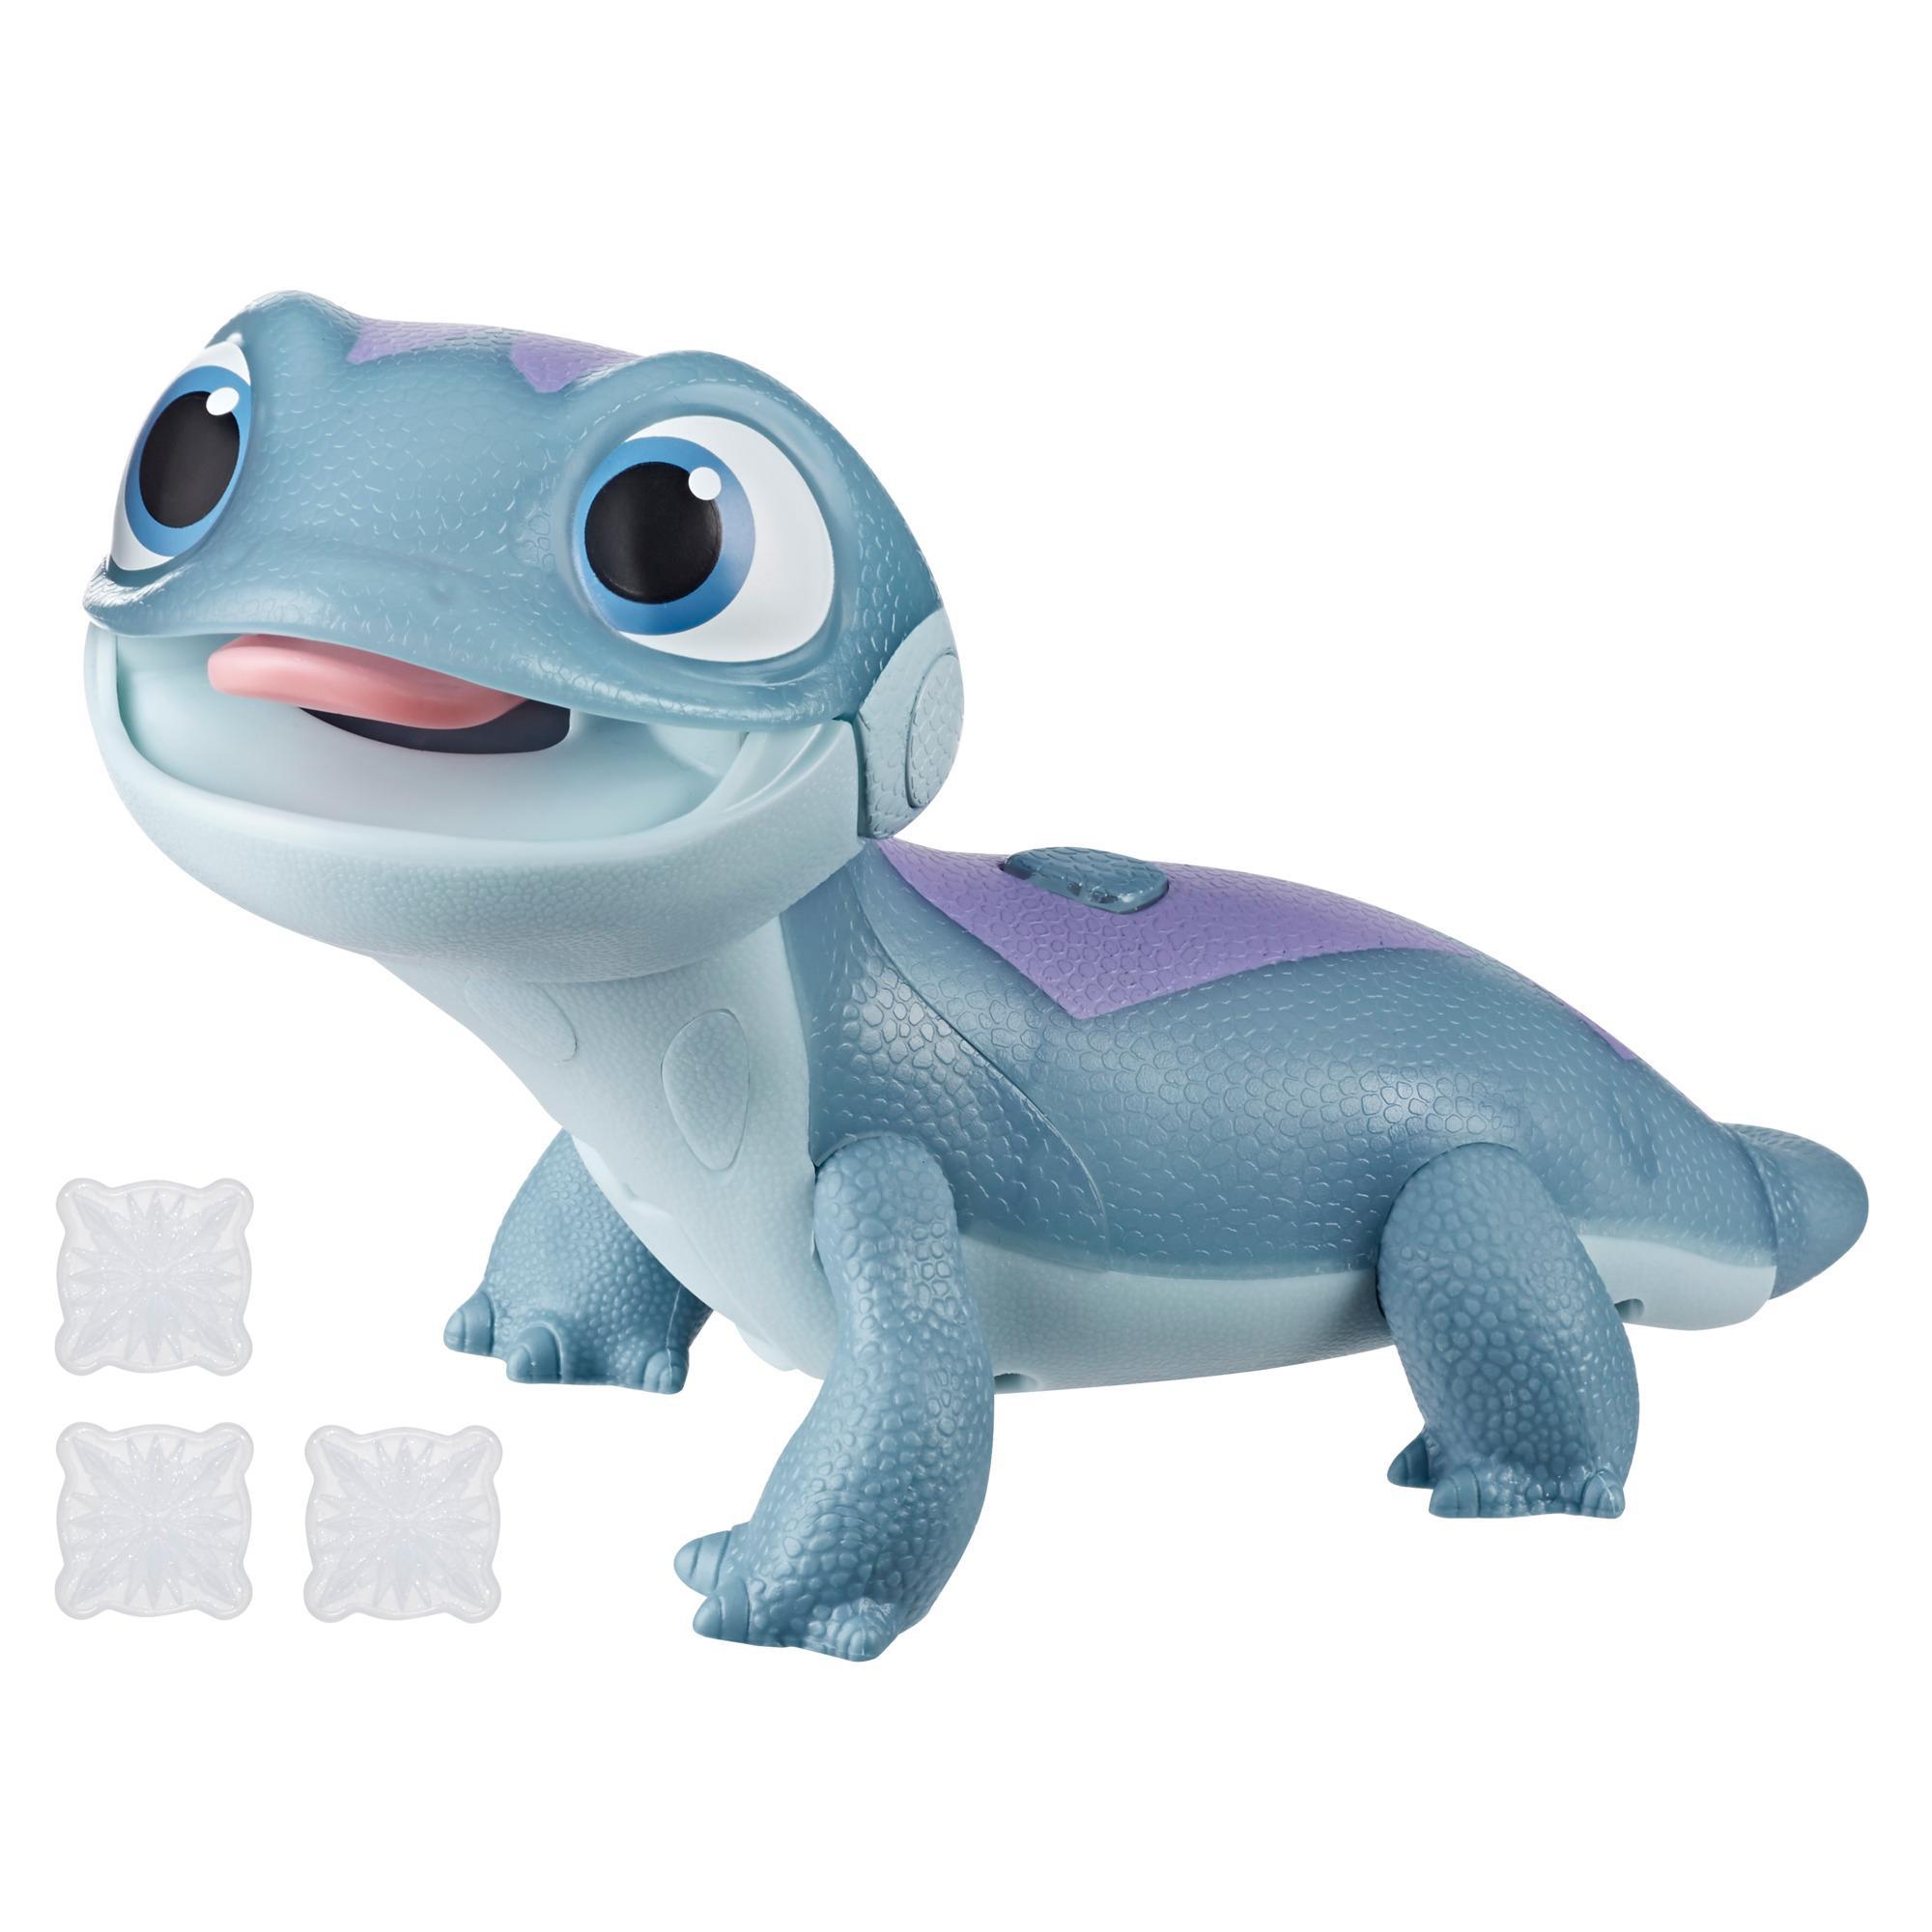 Disney Frozen Fire Spirit's Snowy Snack, Salamander Toy with Lights, Inspired by Disney's Frozen 2 Movie